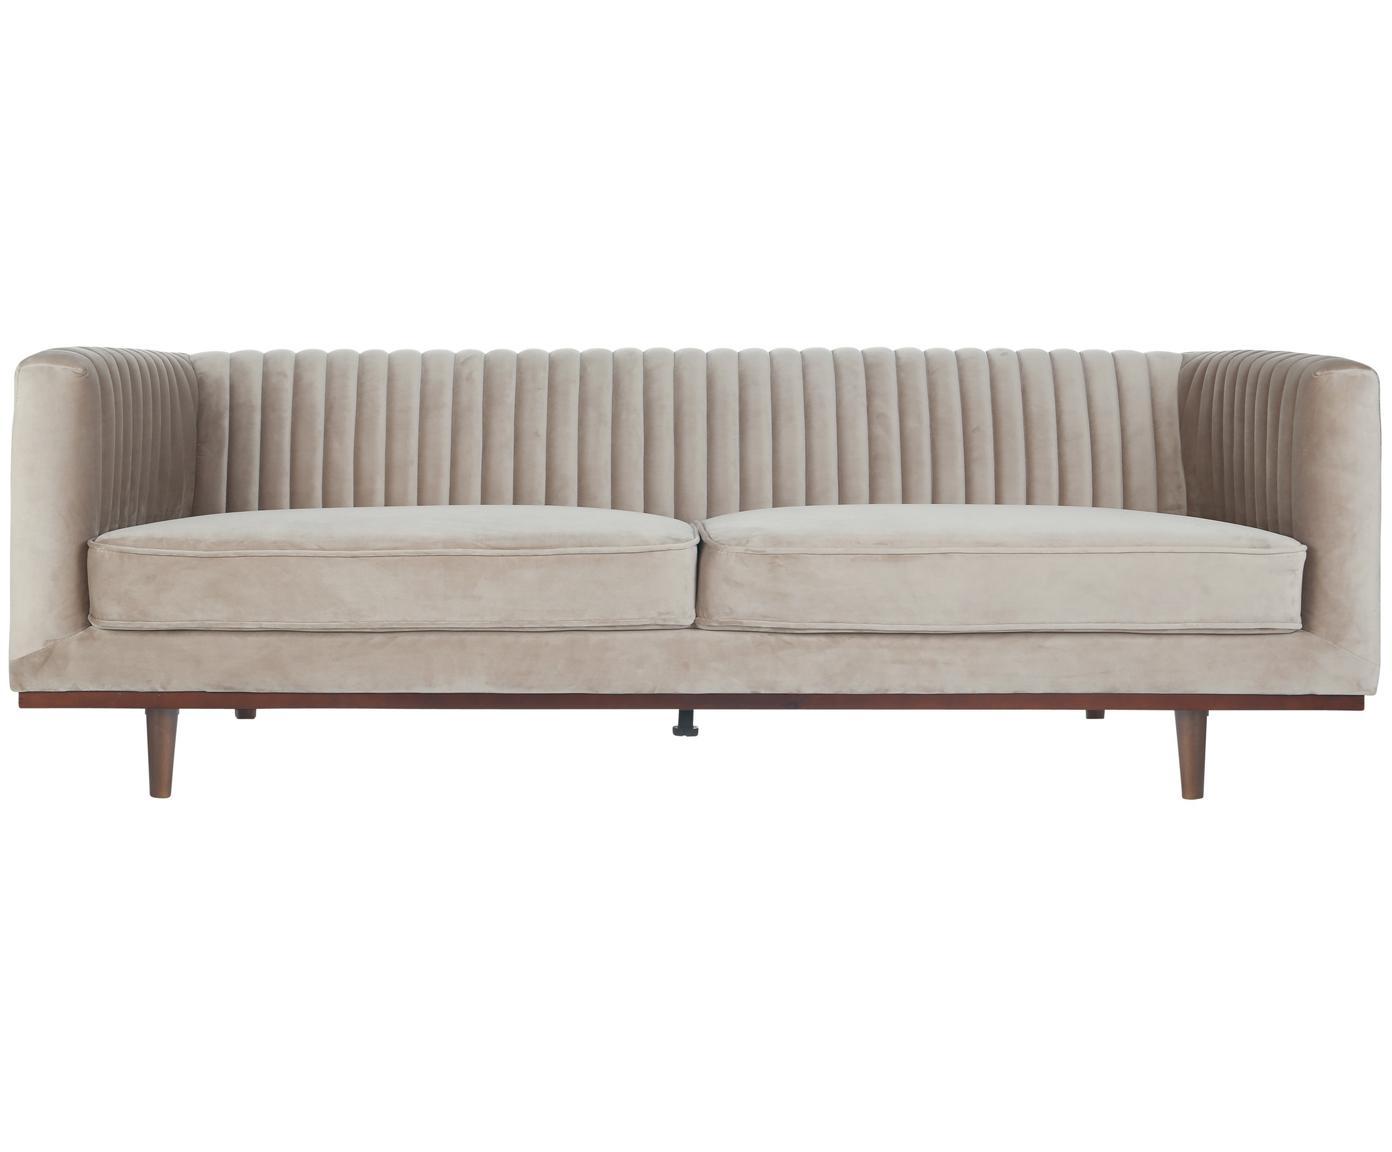 Samt-Sofa Dante (3-Sitzer), Bezug: Polyestersamt, Gestell: Kautschukbaumholz, klarla, Samt Beige, B 210 x T 87 cm